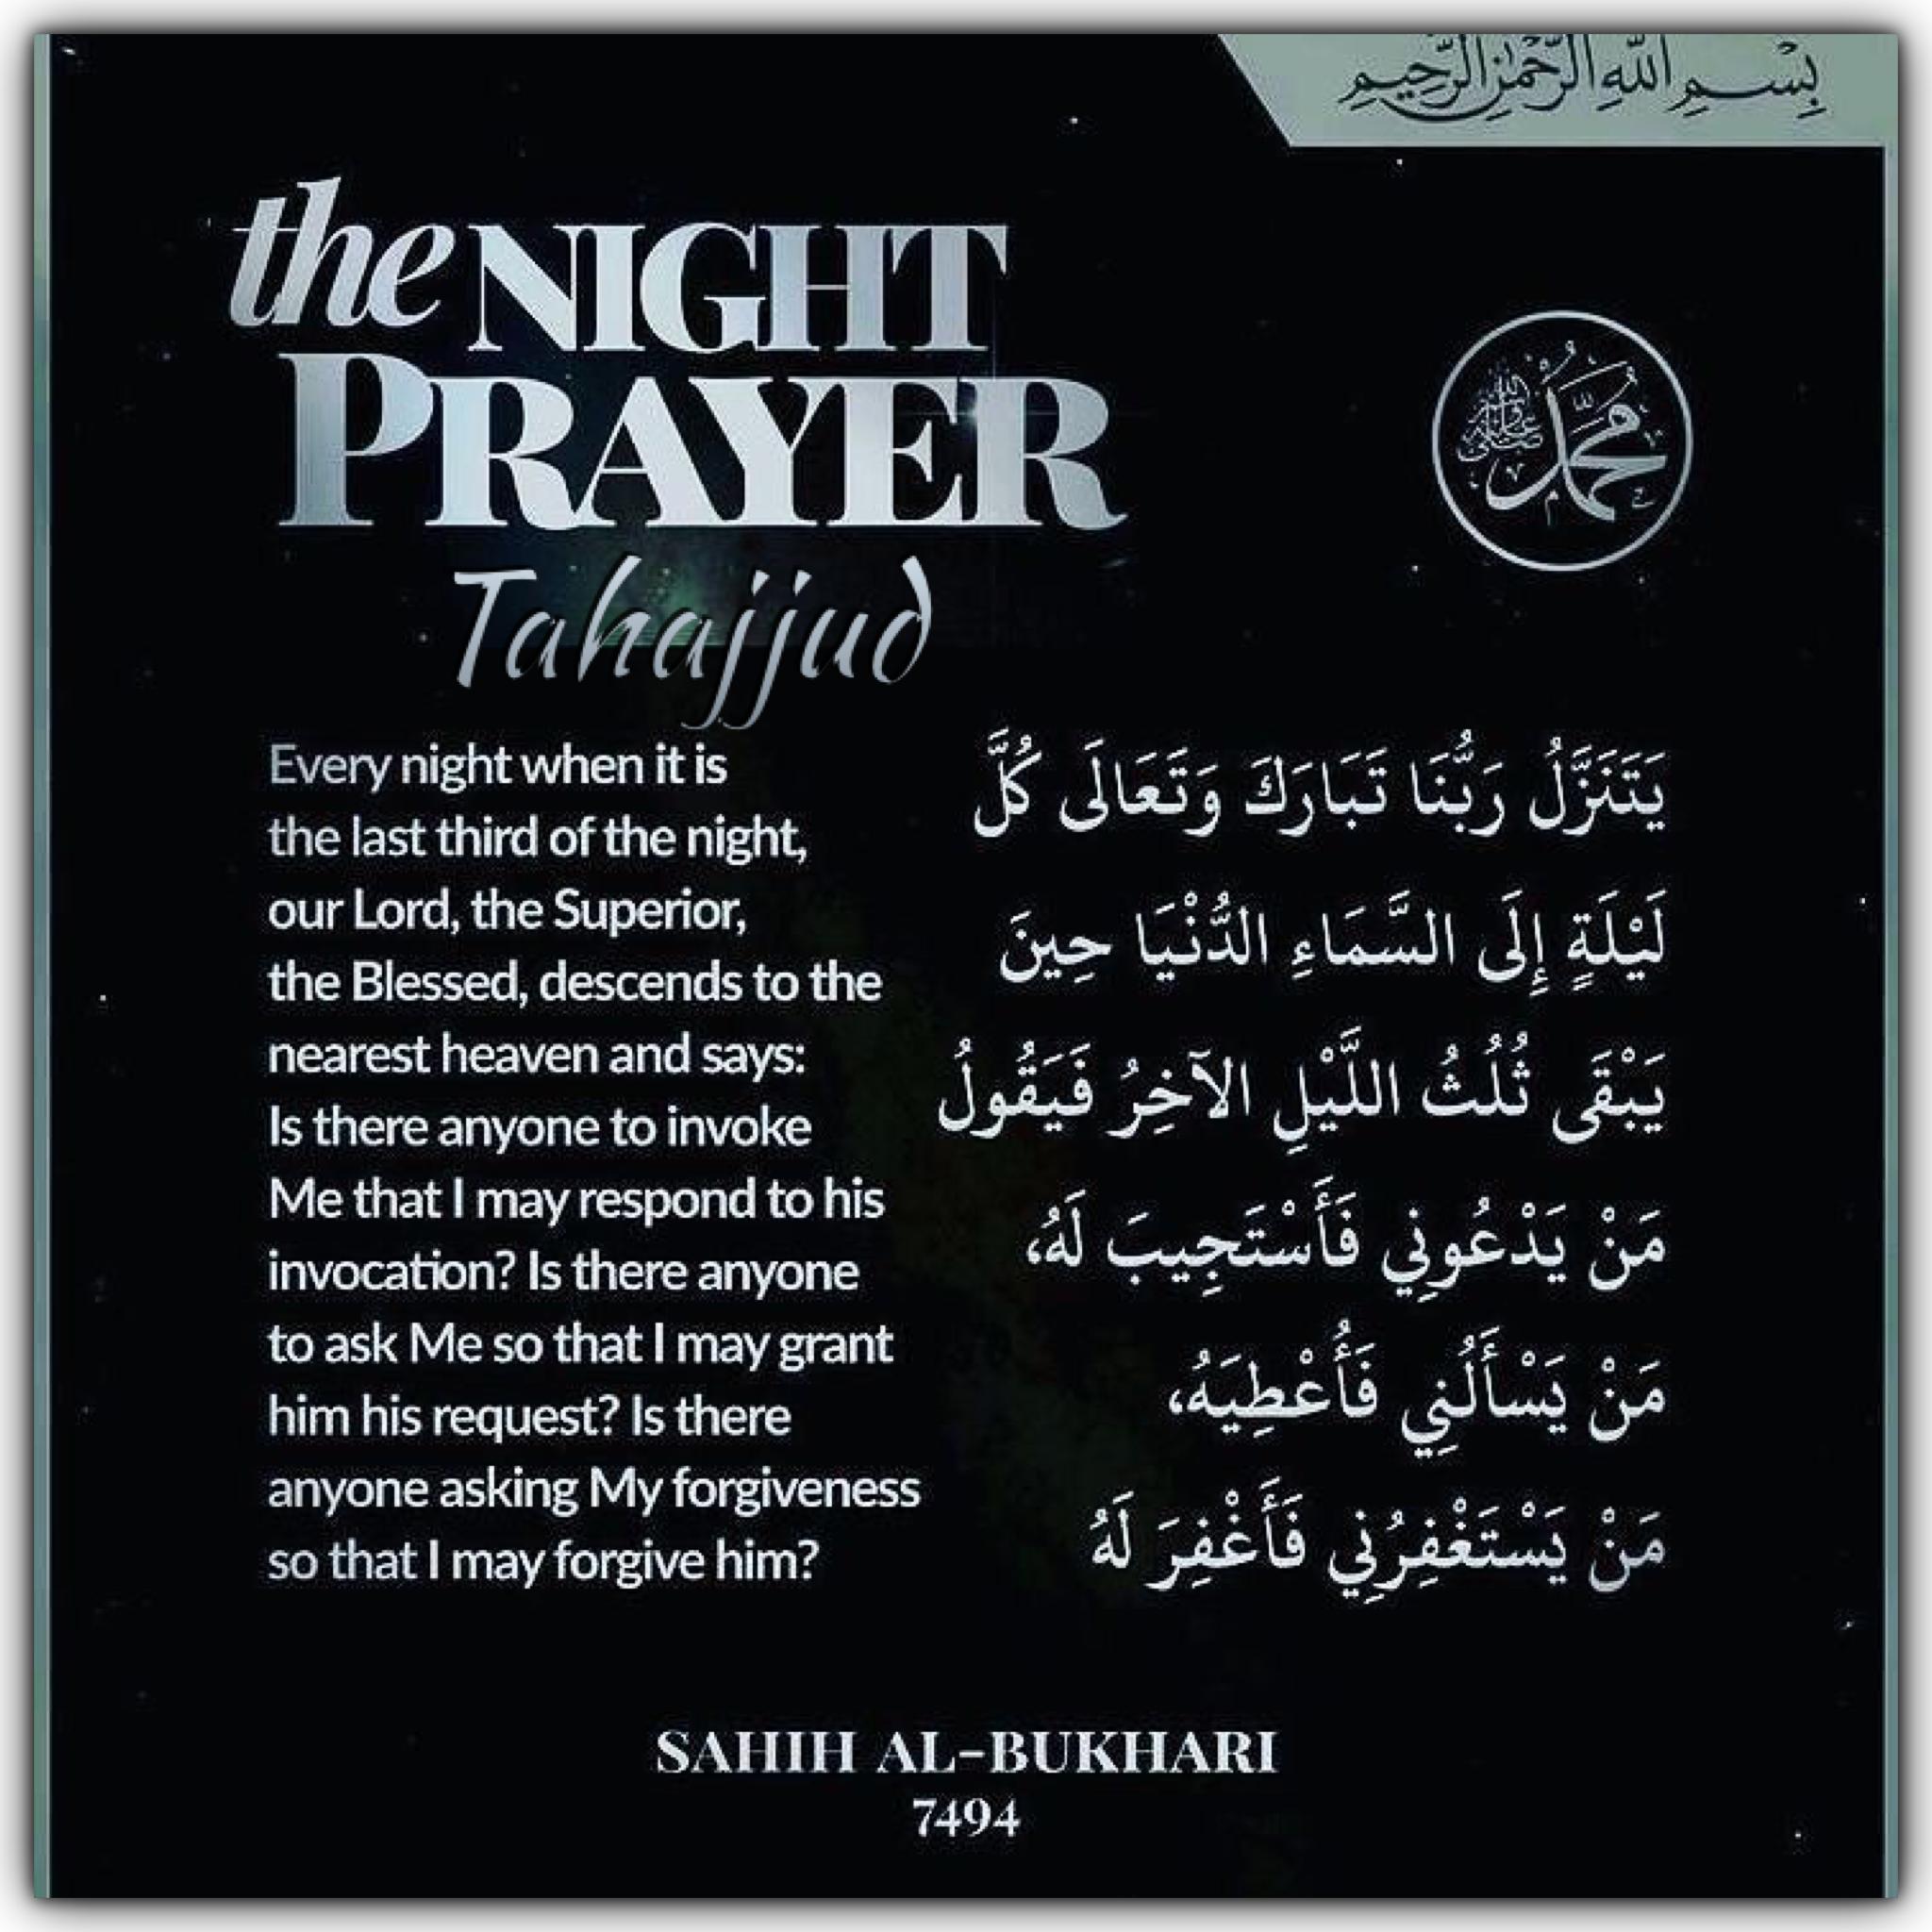 Pin by dawood hannah on tahajjud pinterest islam hadith and muslim kristyandbryce Choice Image